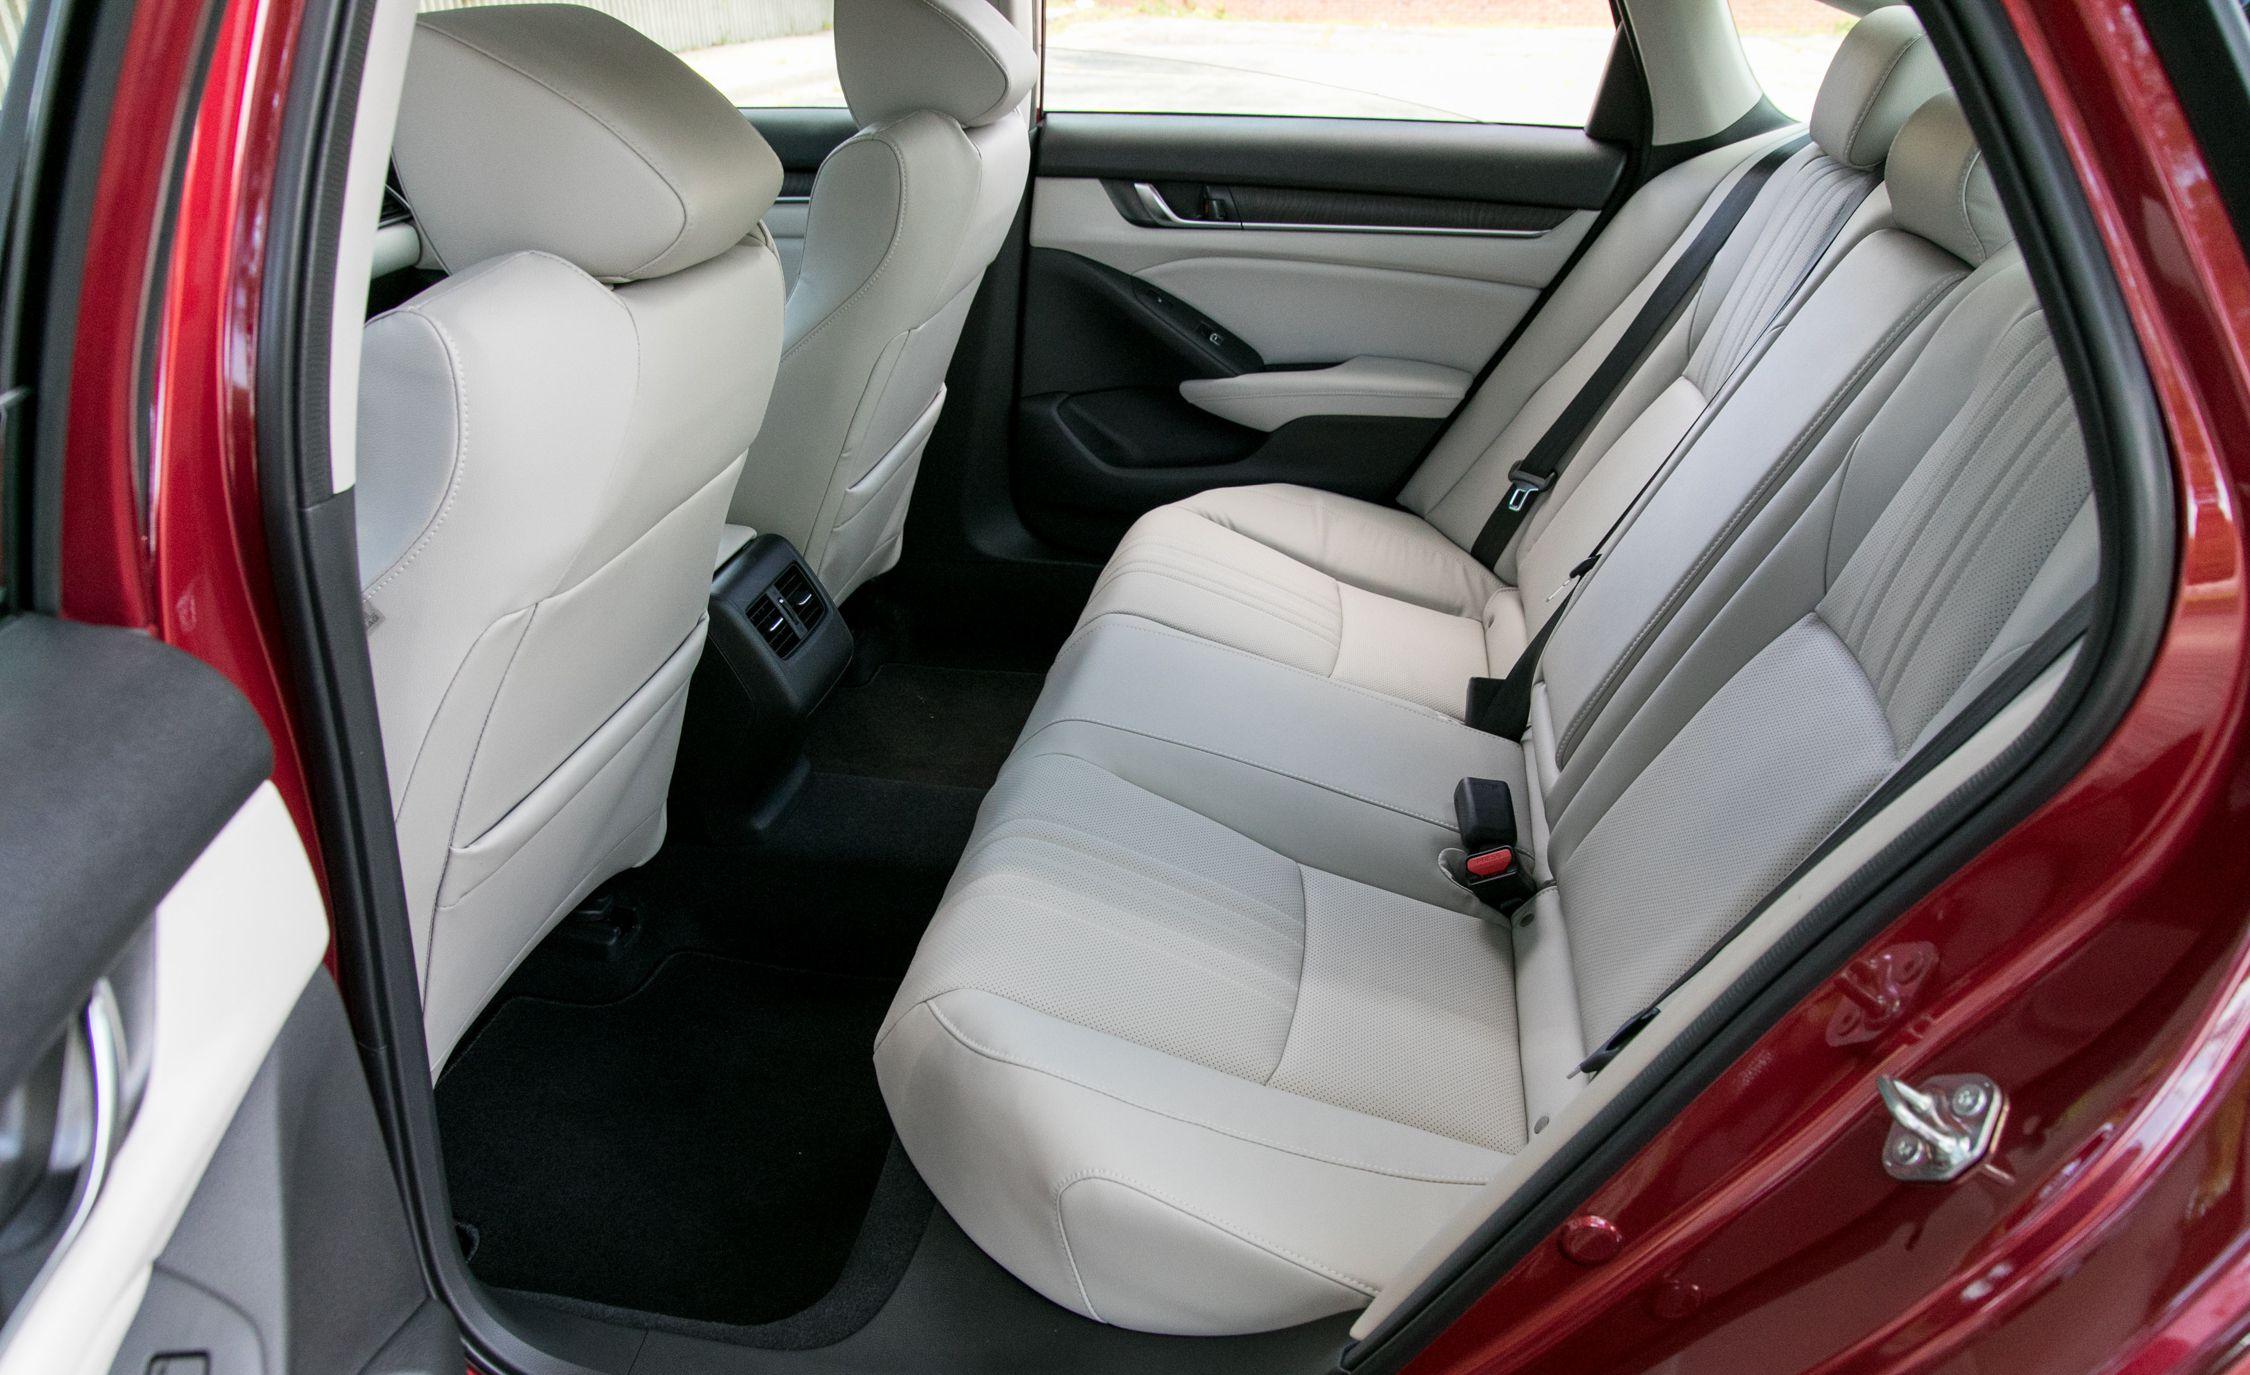 2018 Honda Accord Hybrid Interior Rear Seats Wallpapers (14)